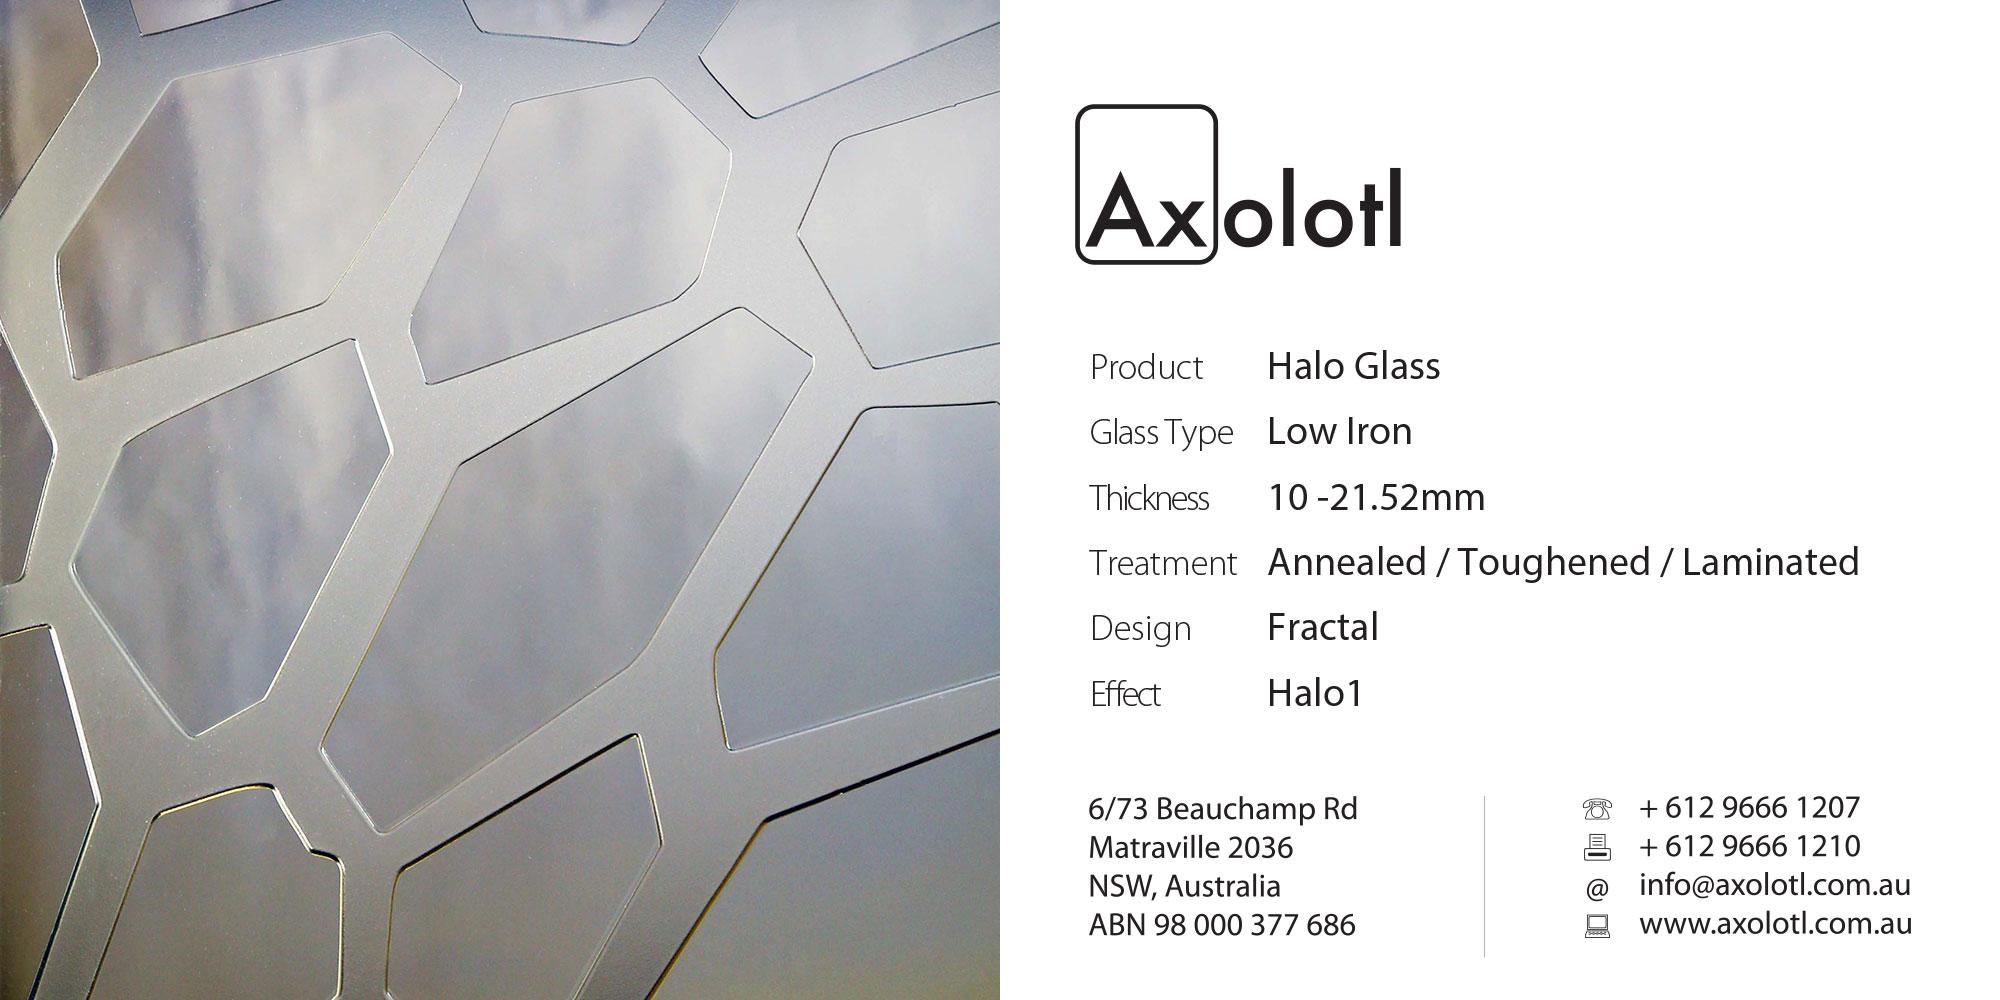 Axolotl_Halo_Fractal.jpg